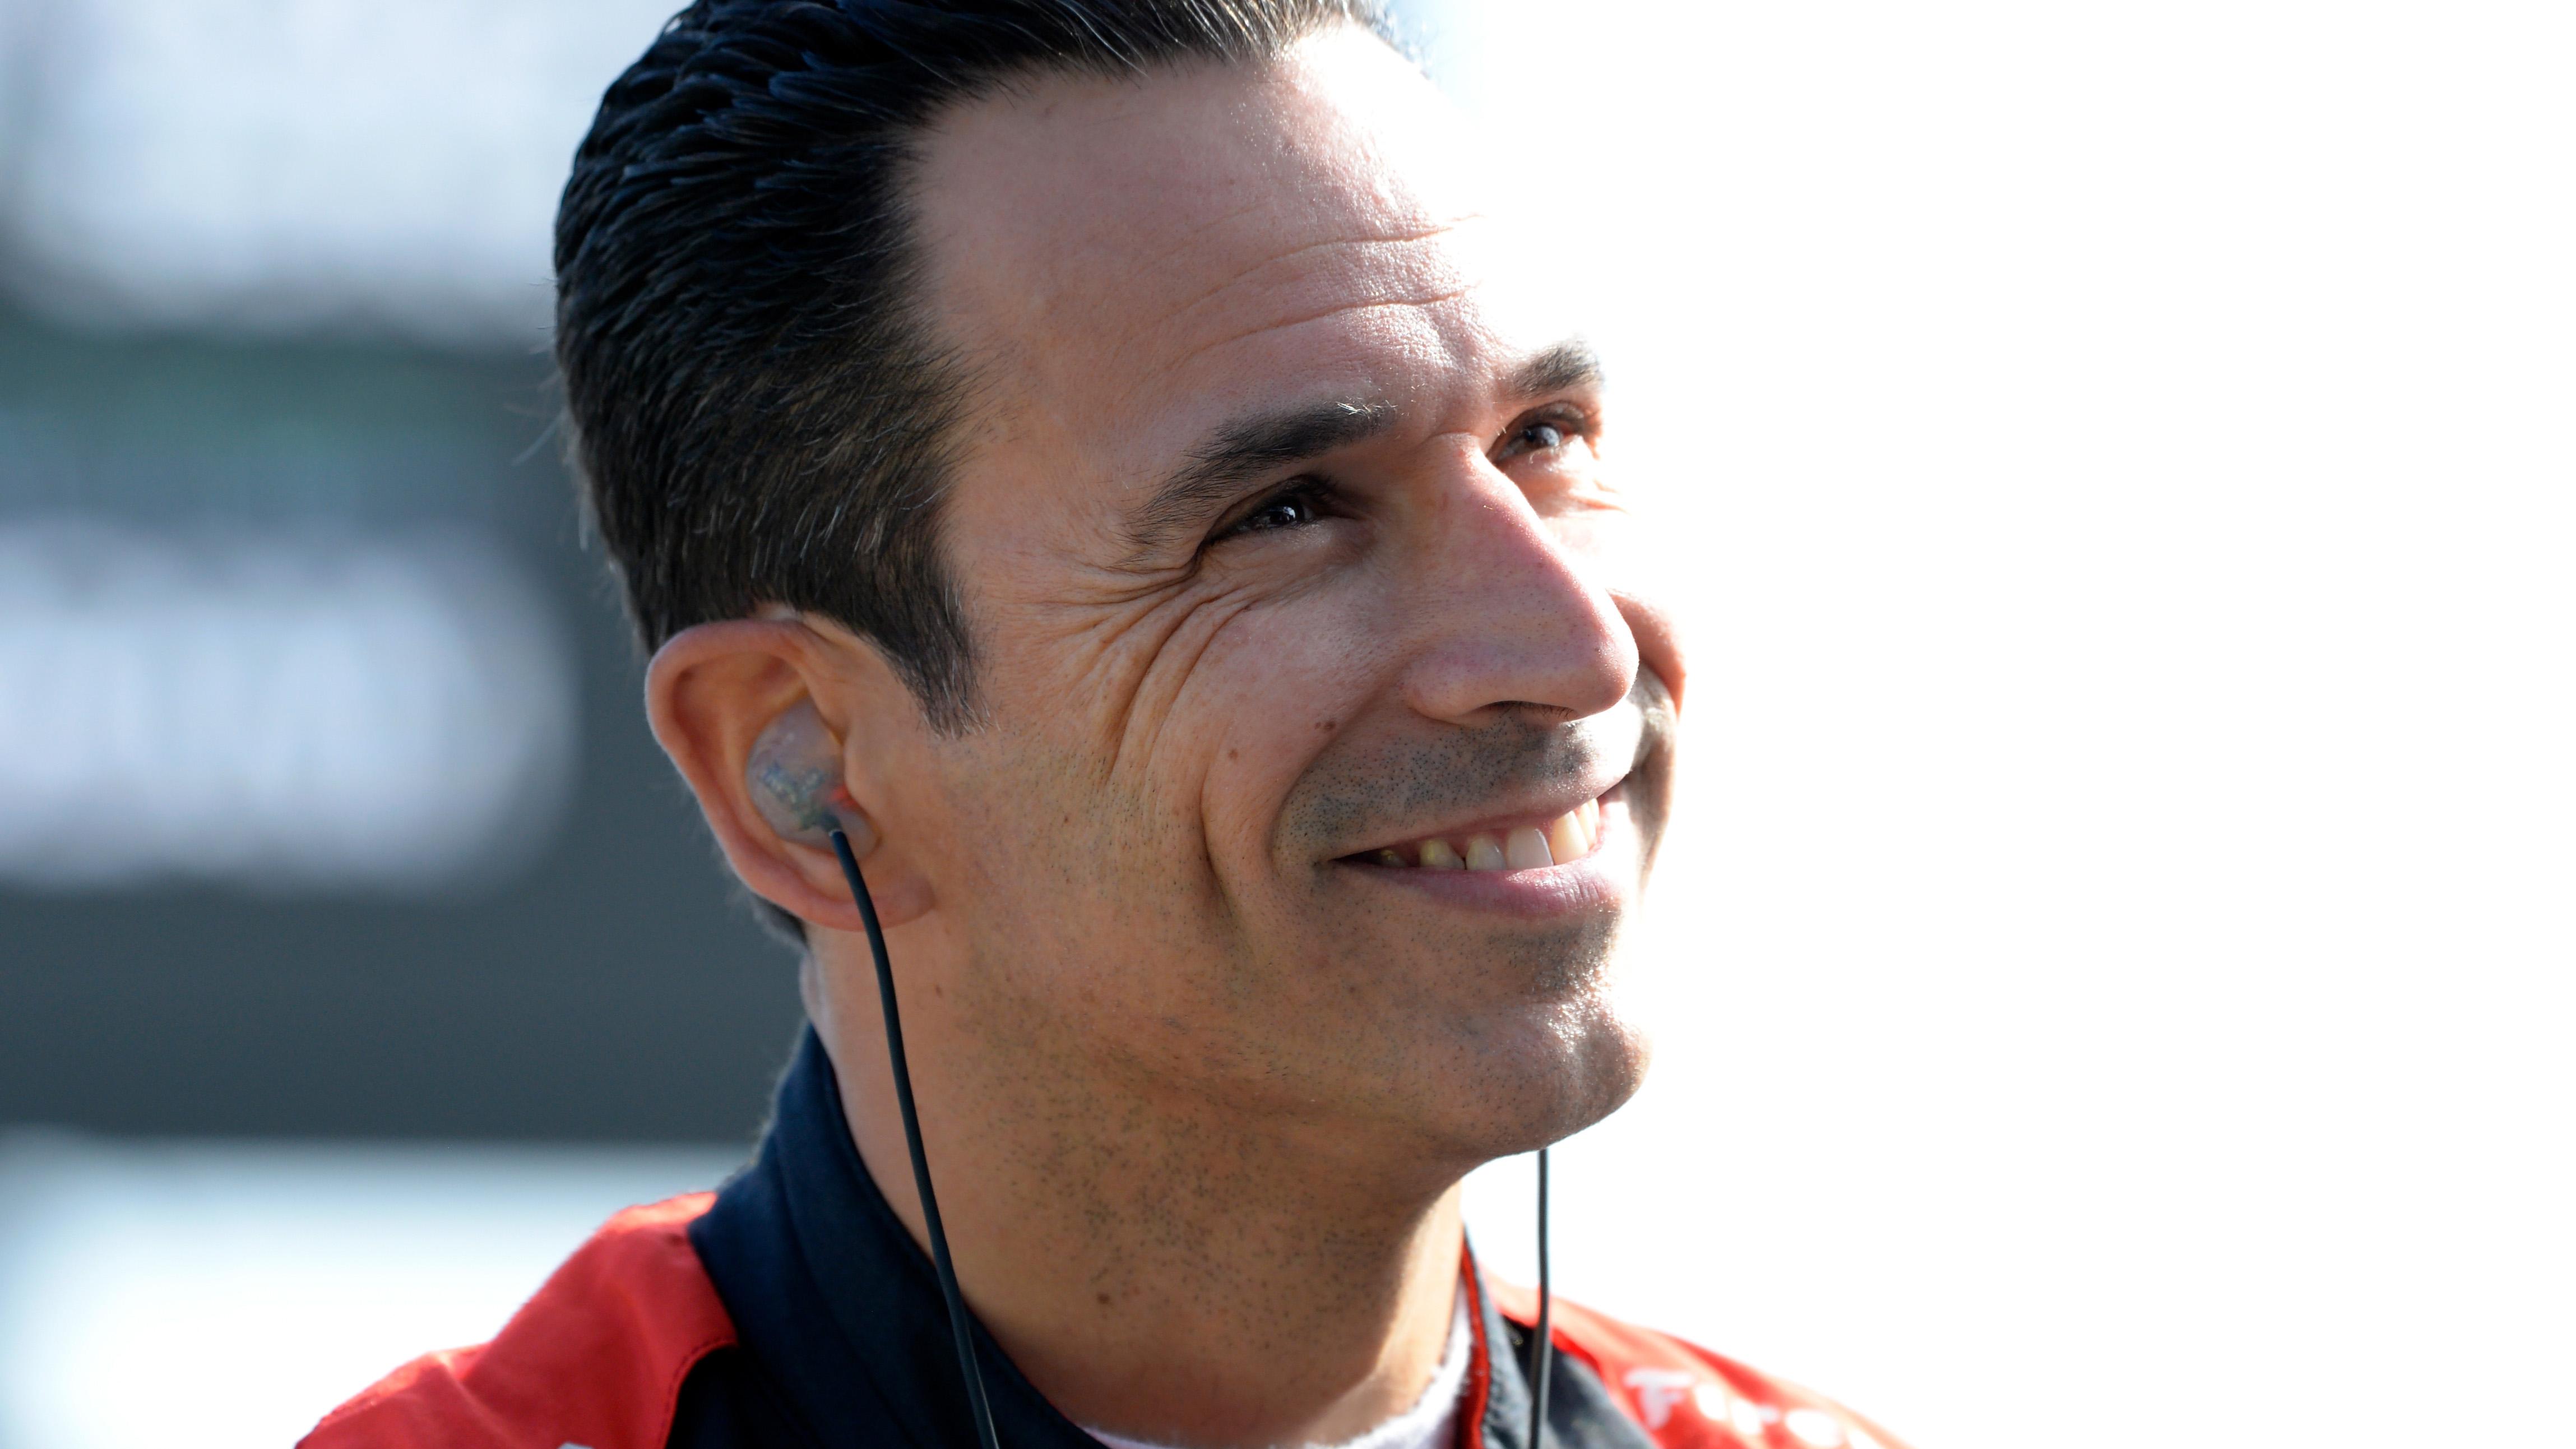 IndyCar Rapid Fire: Team Penske's Helio Castroneves teaches dance moves